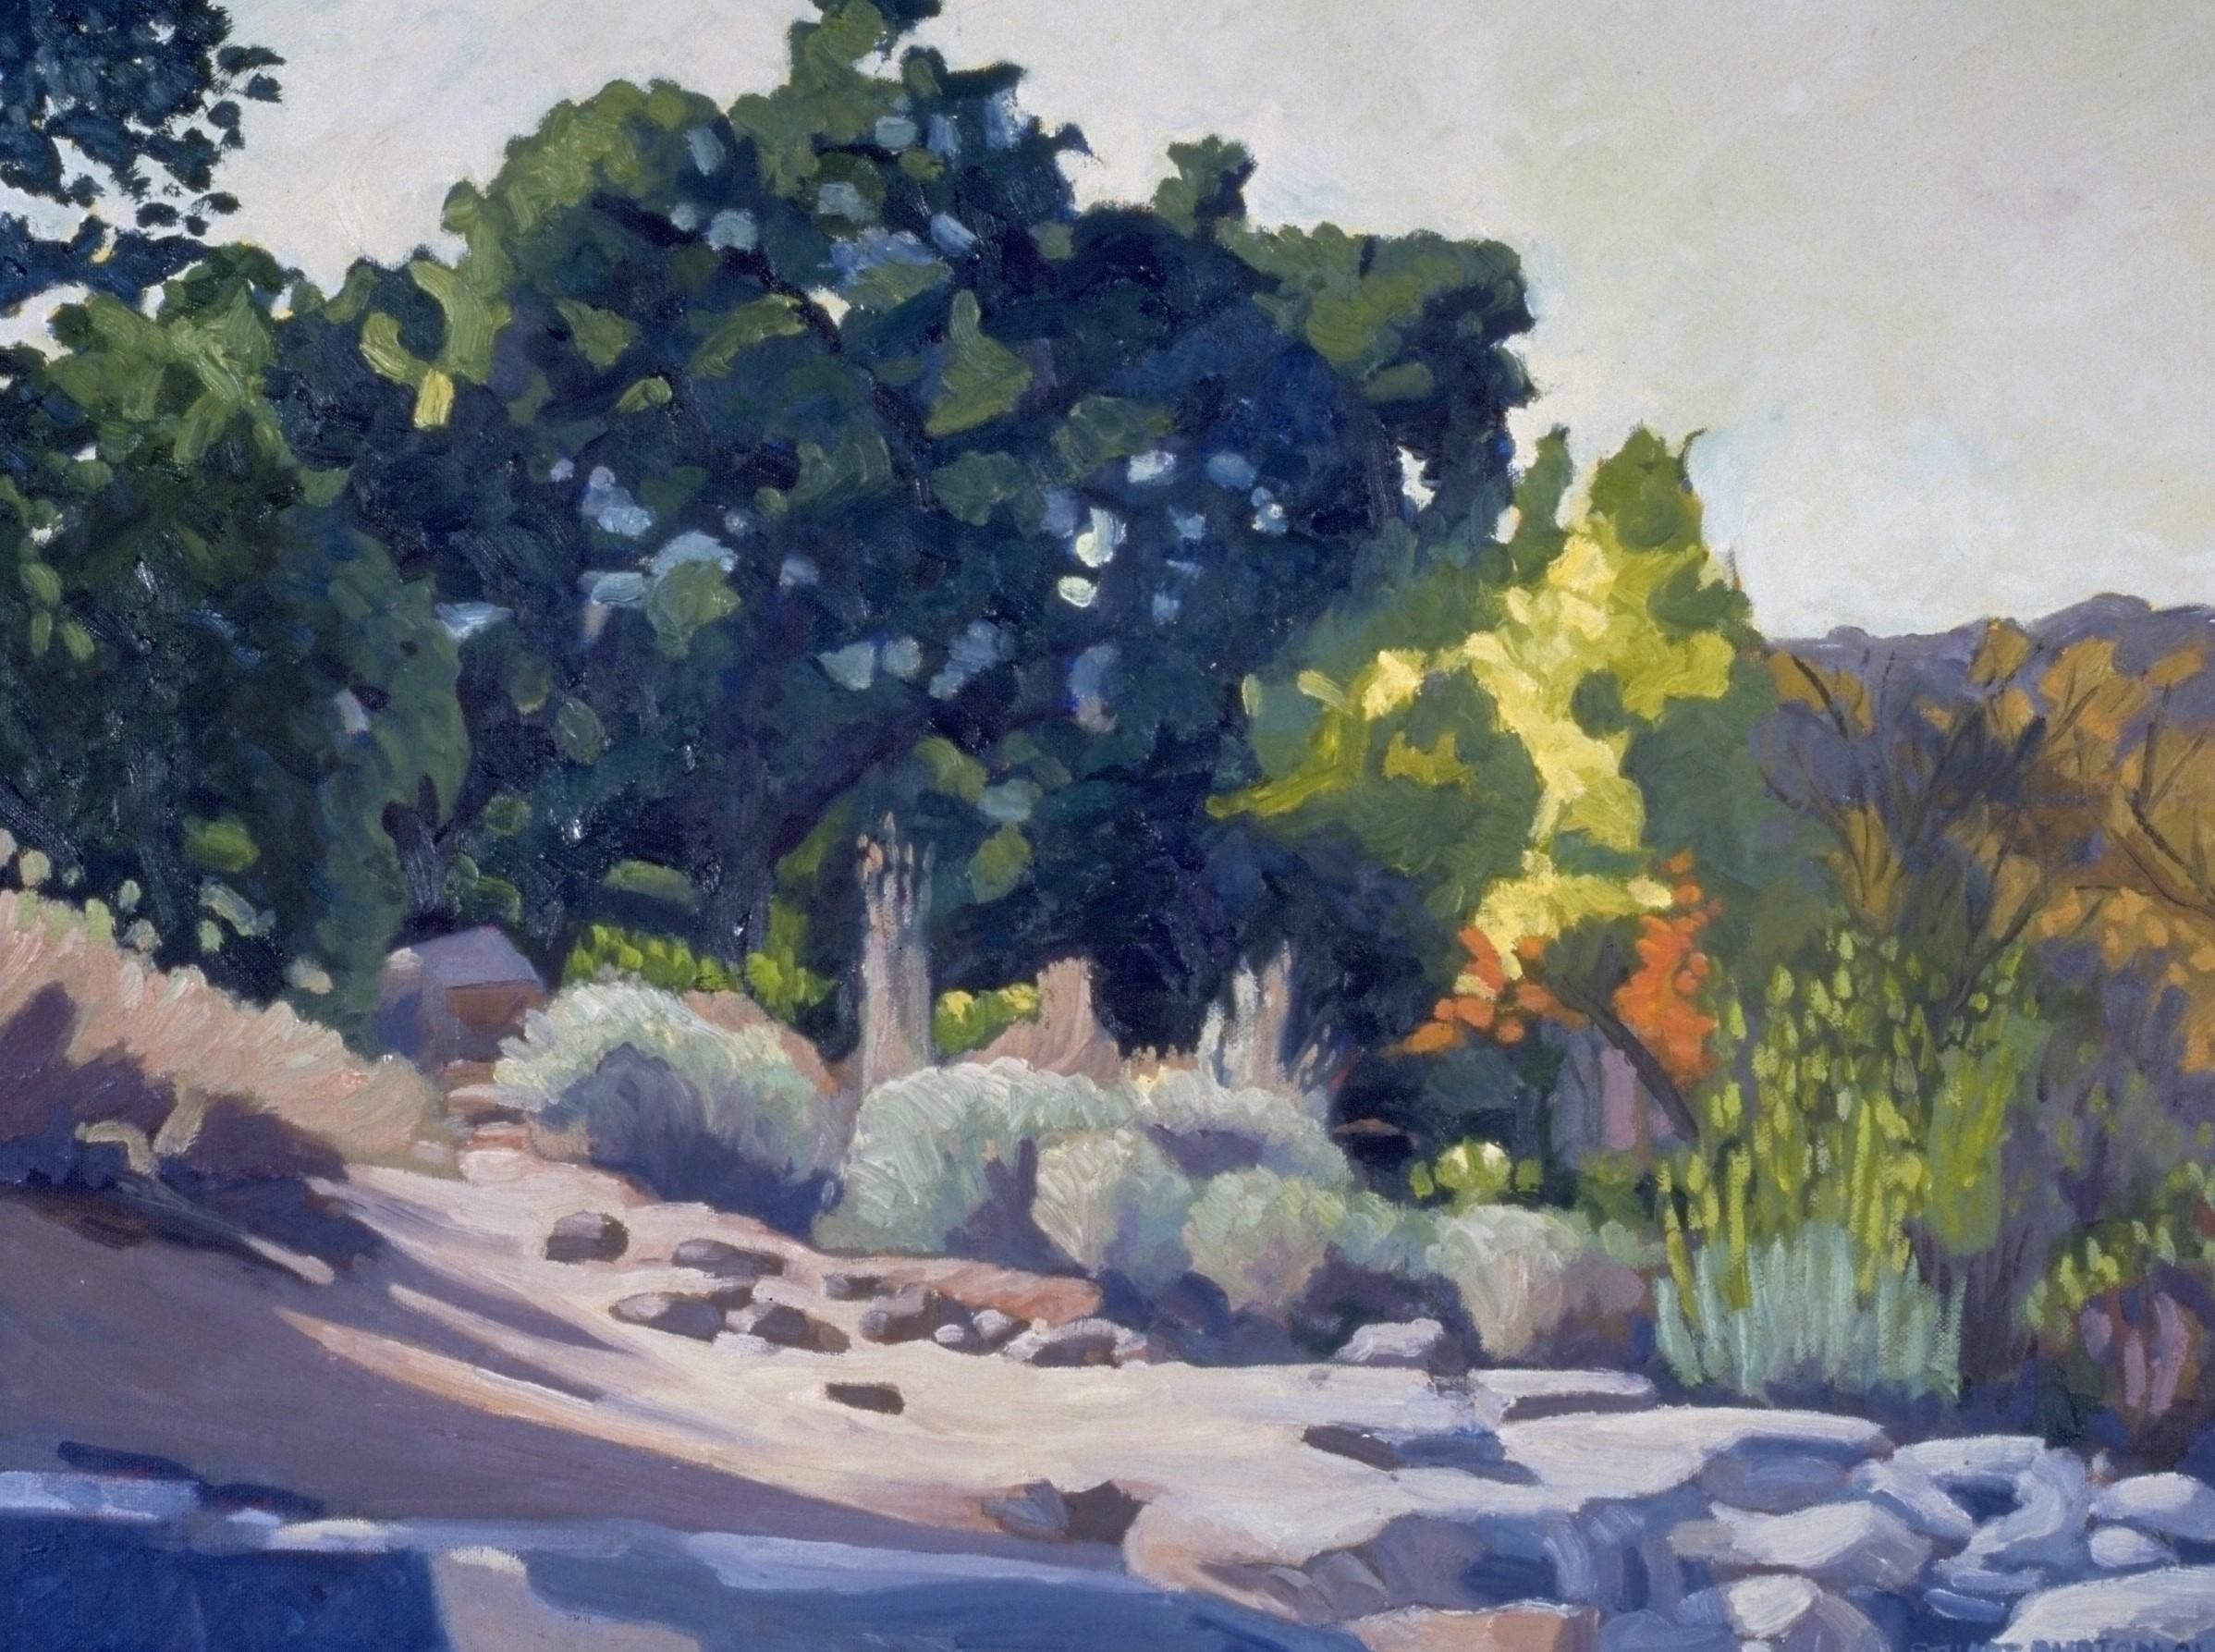 Grinding Rocks, Mission Trails Park  16x24  Oil on Panel  2000